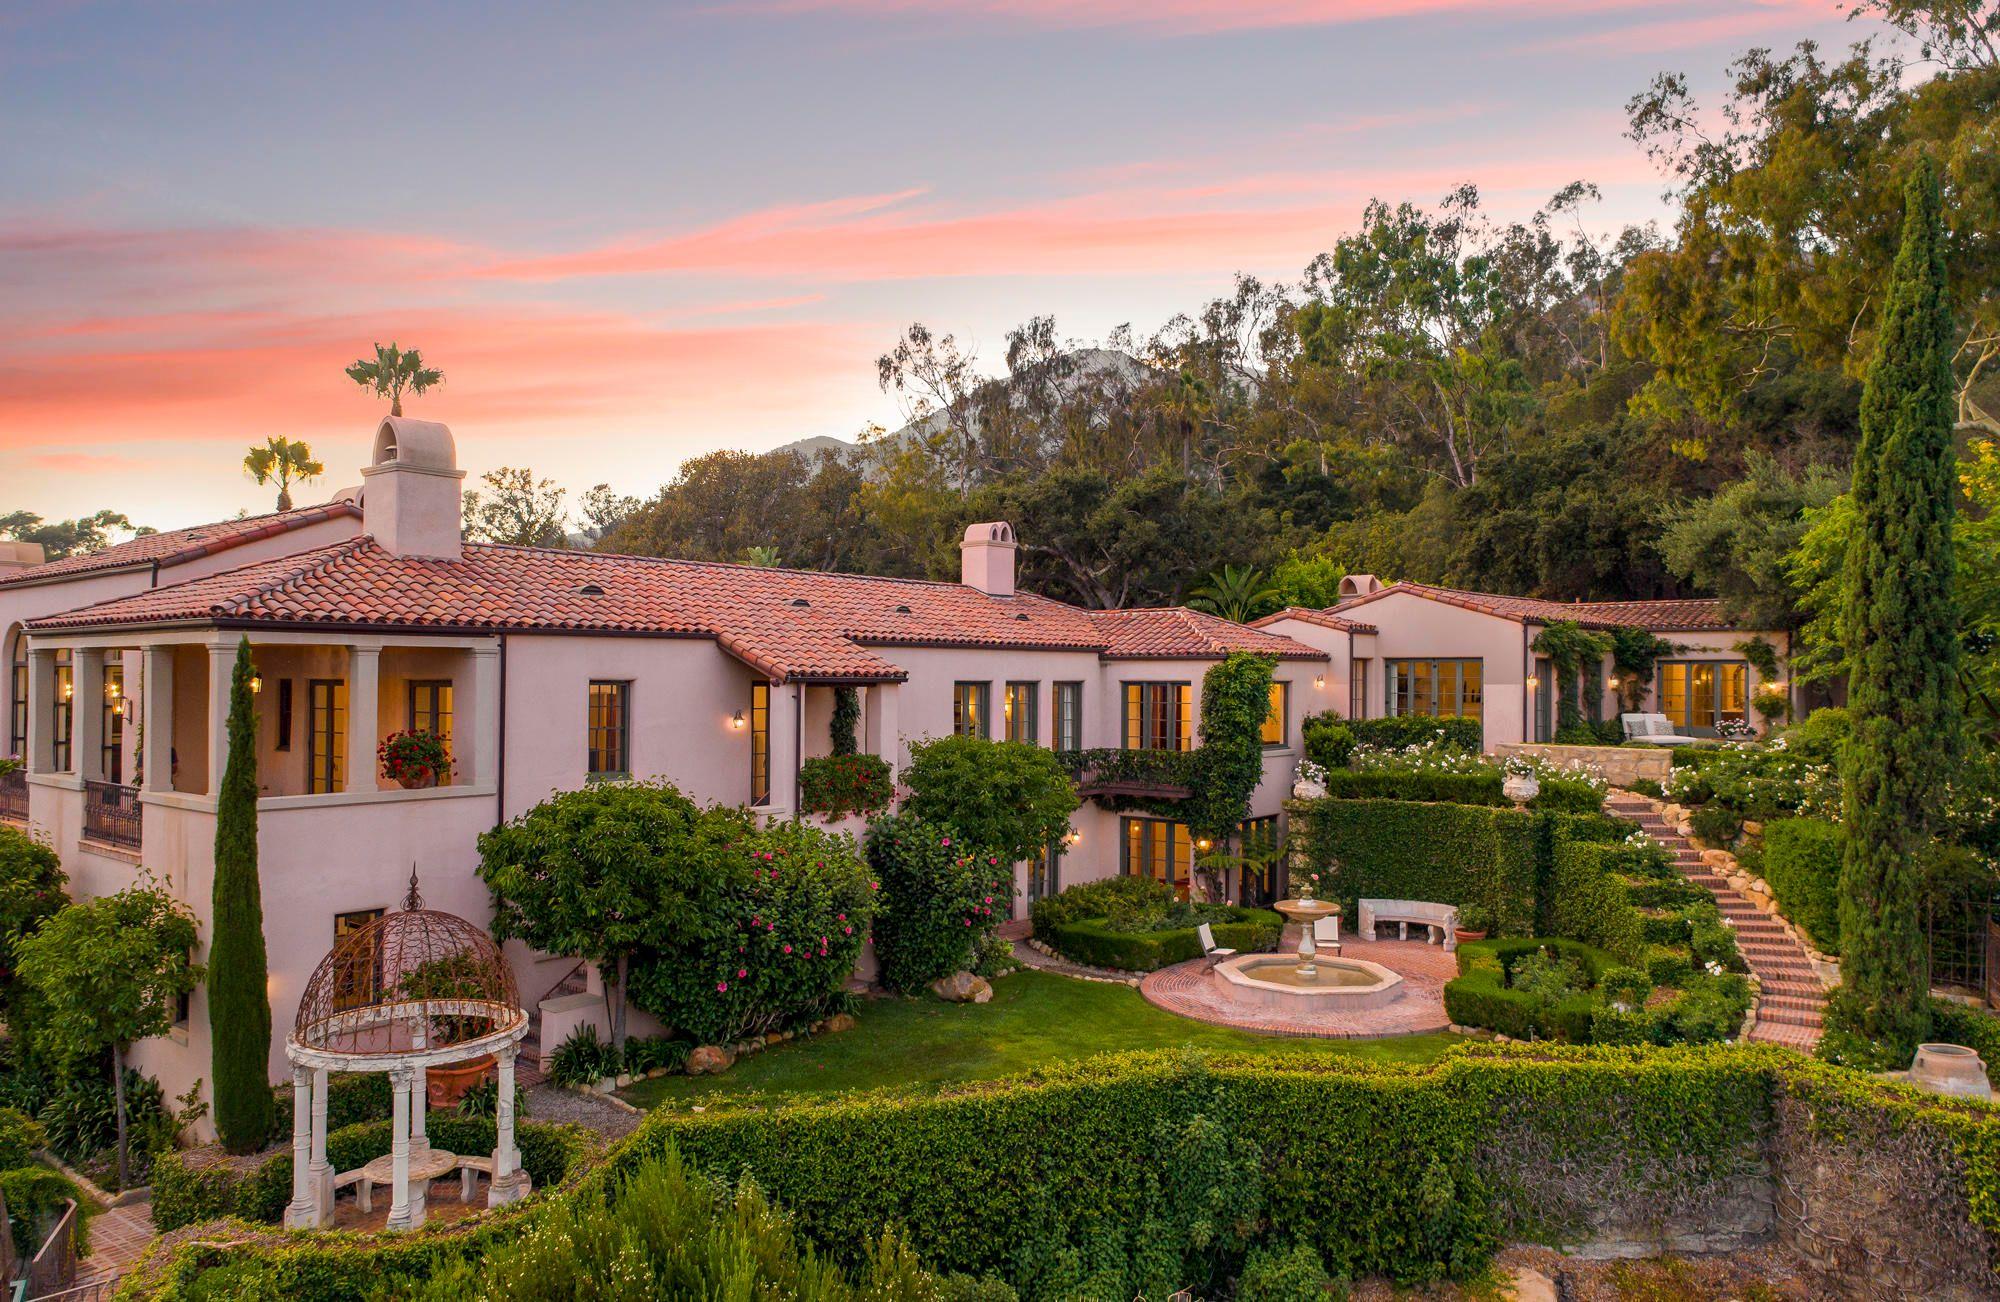 1050 Cold Springs Rd In 2020 Santa Barbara House Spanish Style Homes Santa Barbara